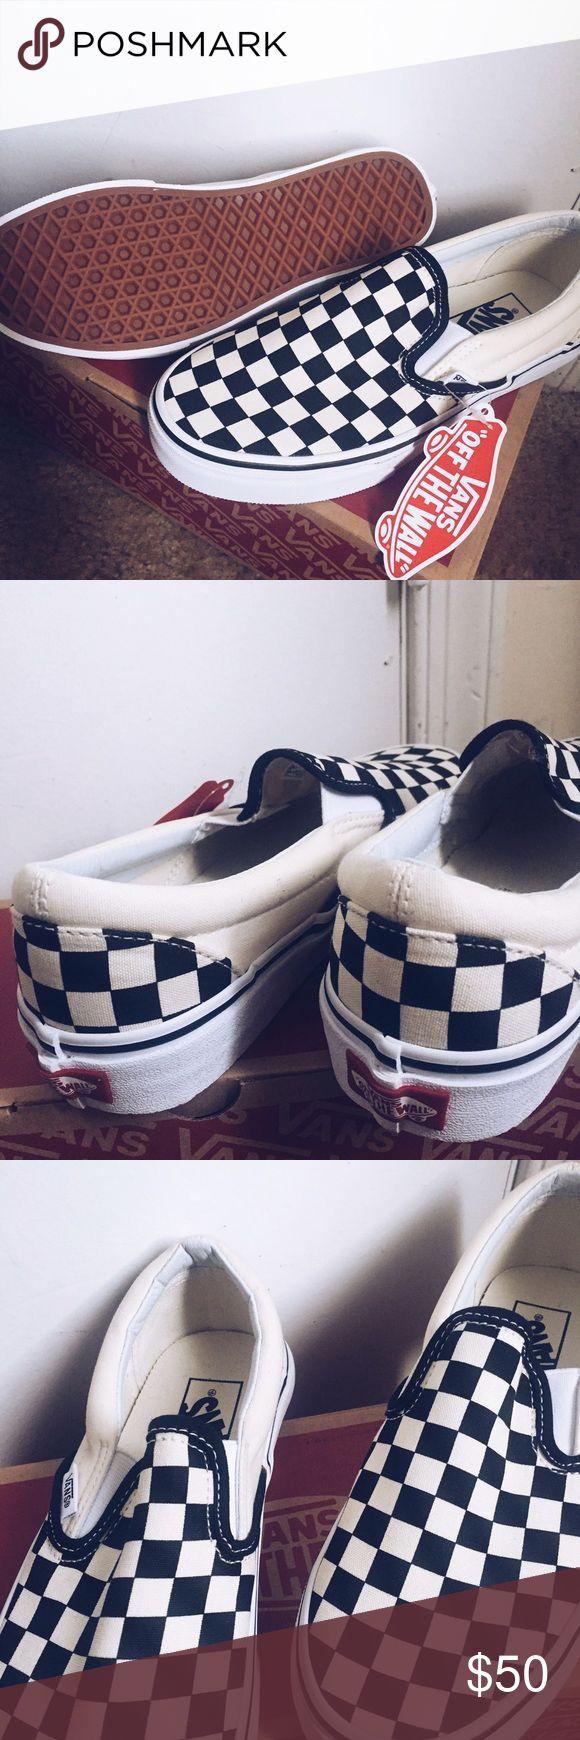 Mens checkered vans New! never work size 5.5 for men Vans Shoes Sneakers